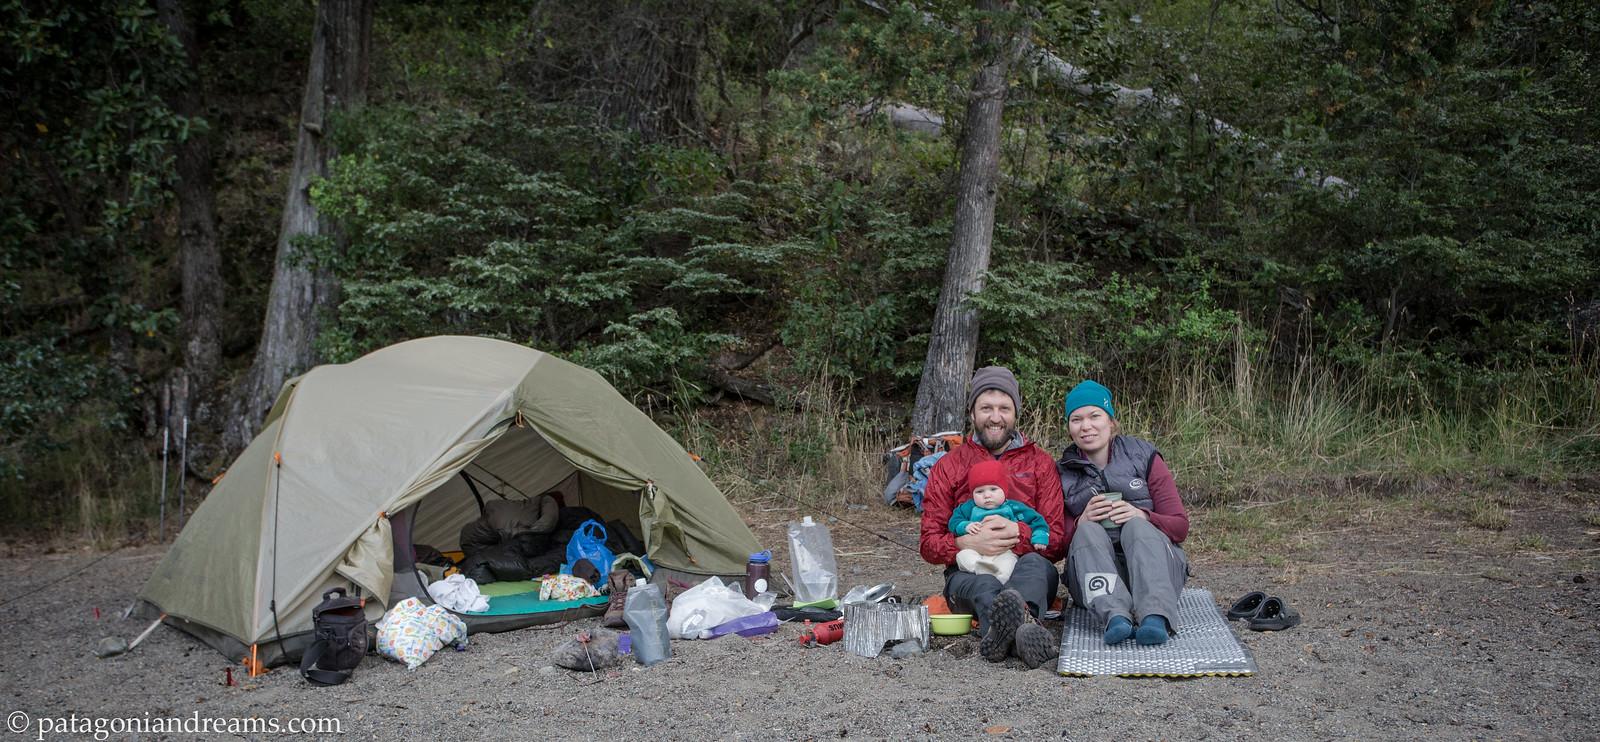 Happy family. Bivaouc on the shores of ago Mascardi in Parque Nacional Nahuel Huapi. Rio Negro. Patagonia. Argentina.